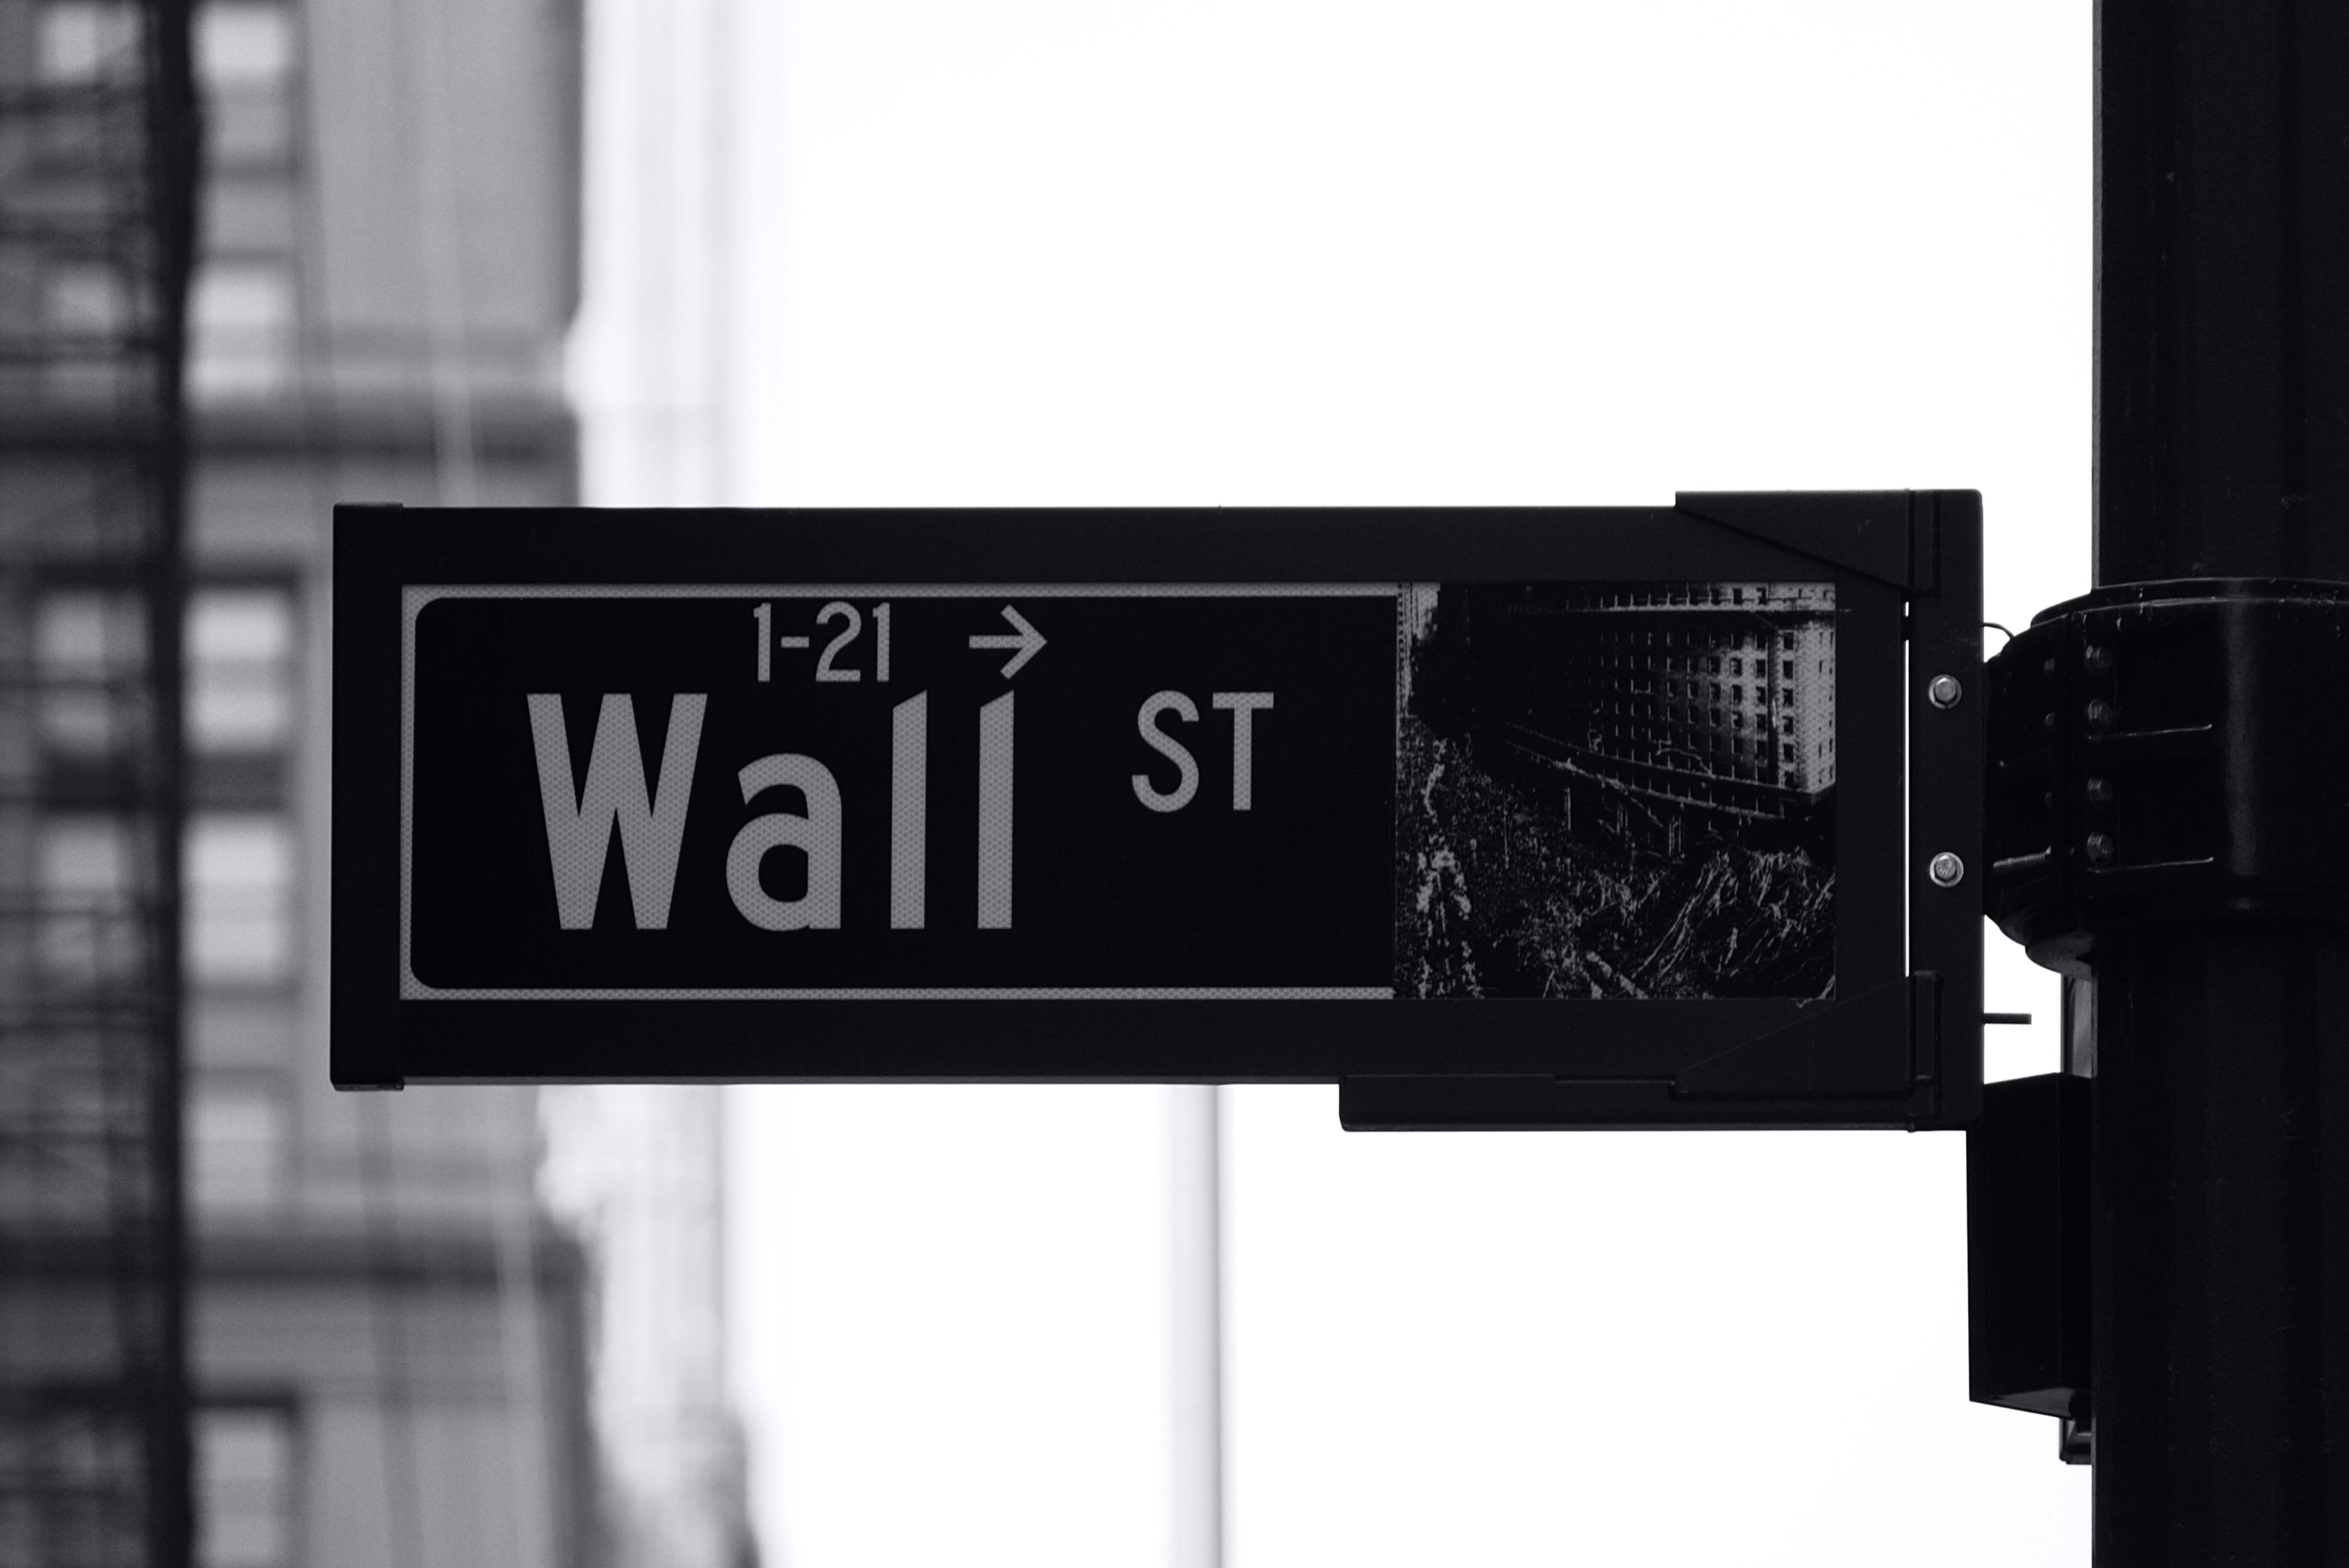 Wall Street street sign